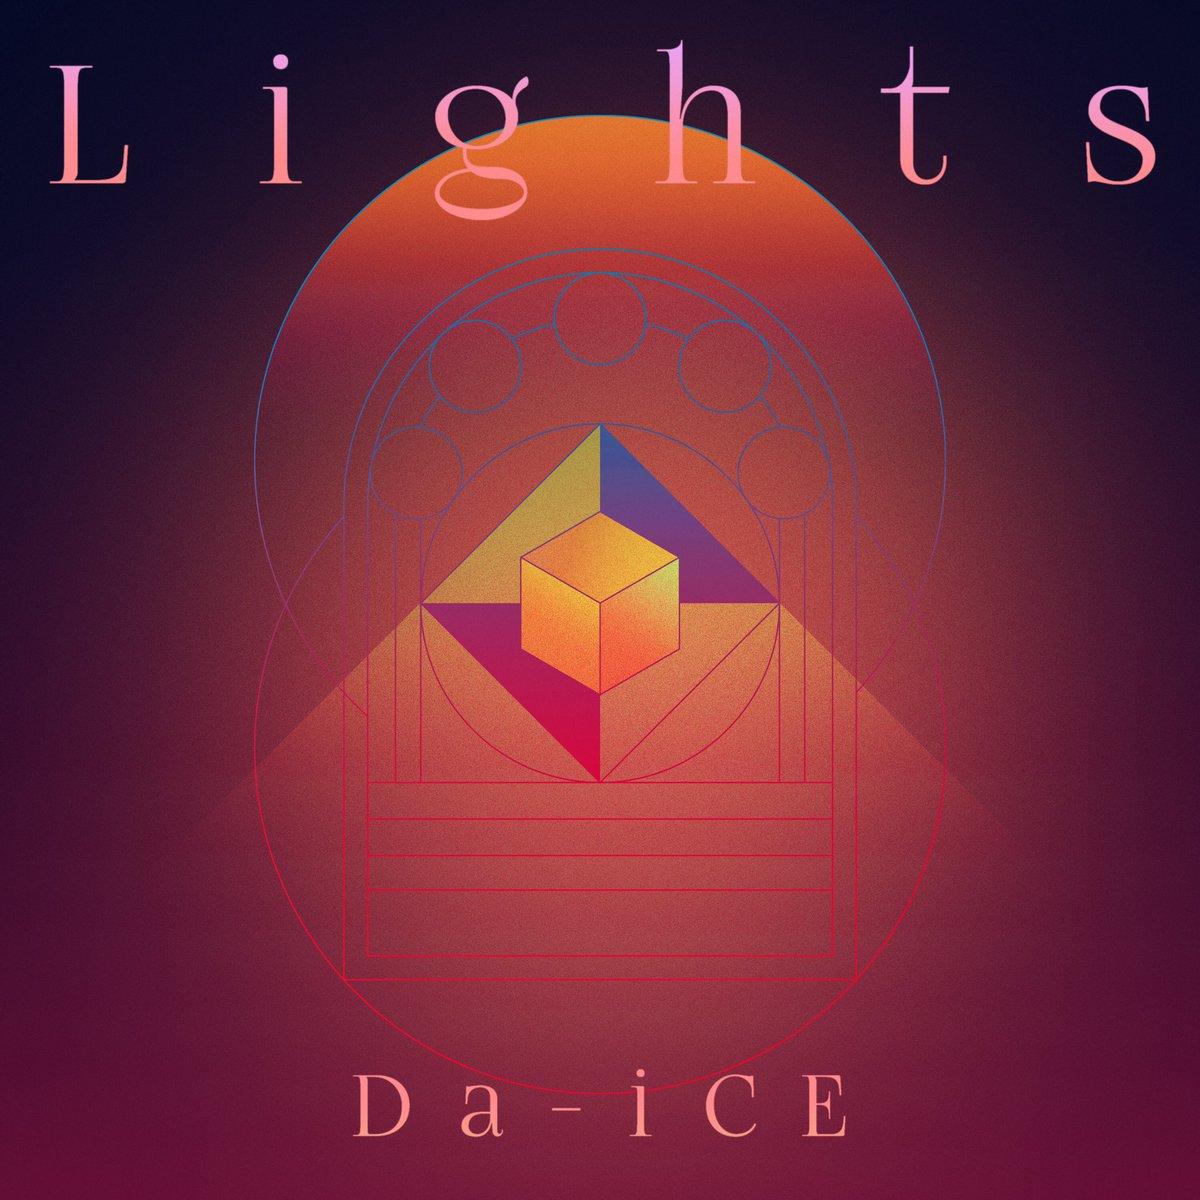 『Da-iCE - Lights』収録の『Lights』ジャケット